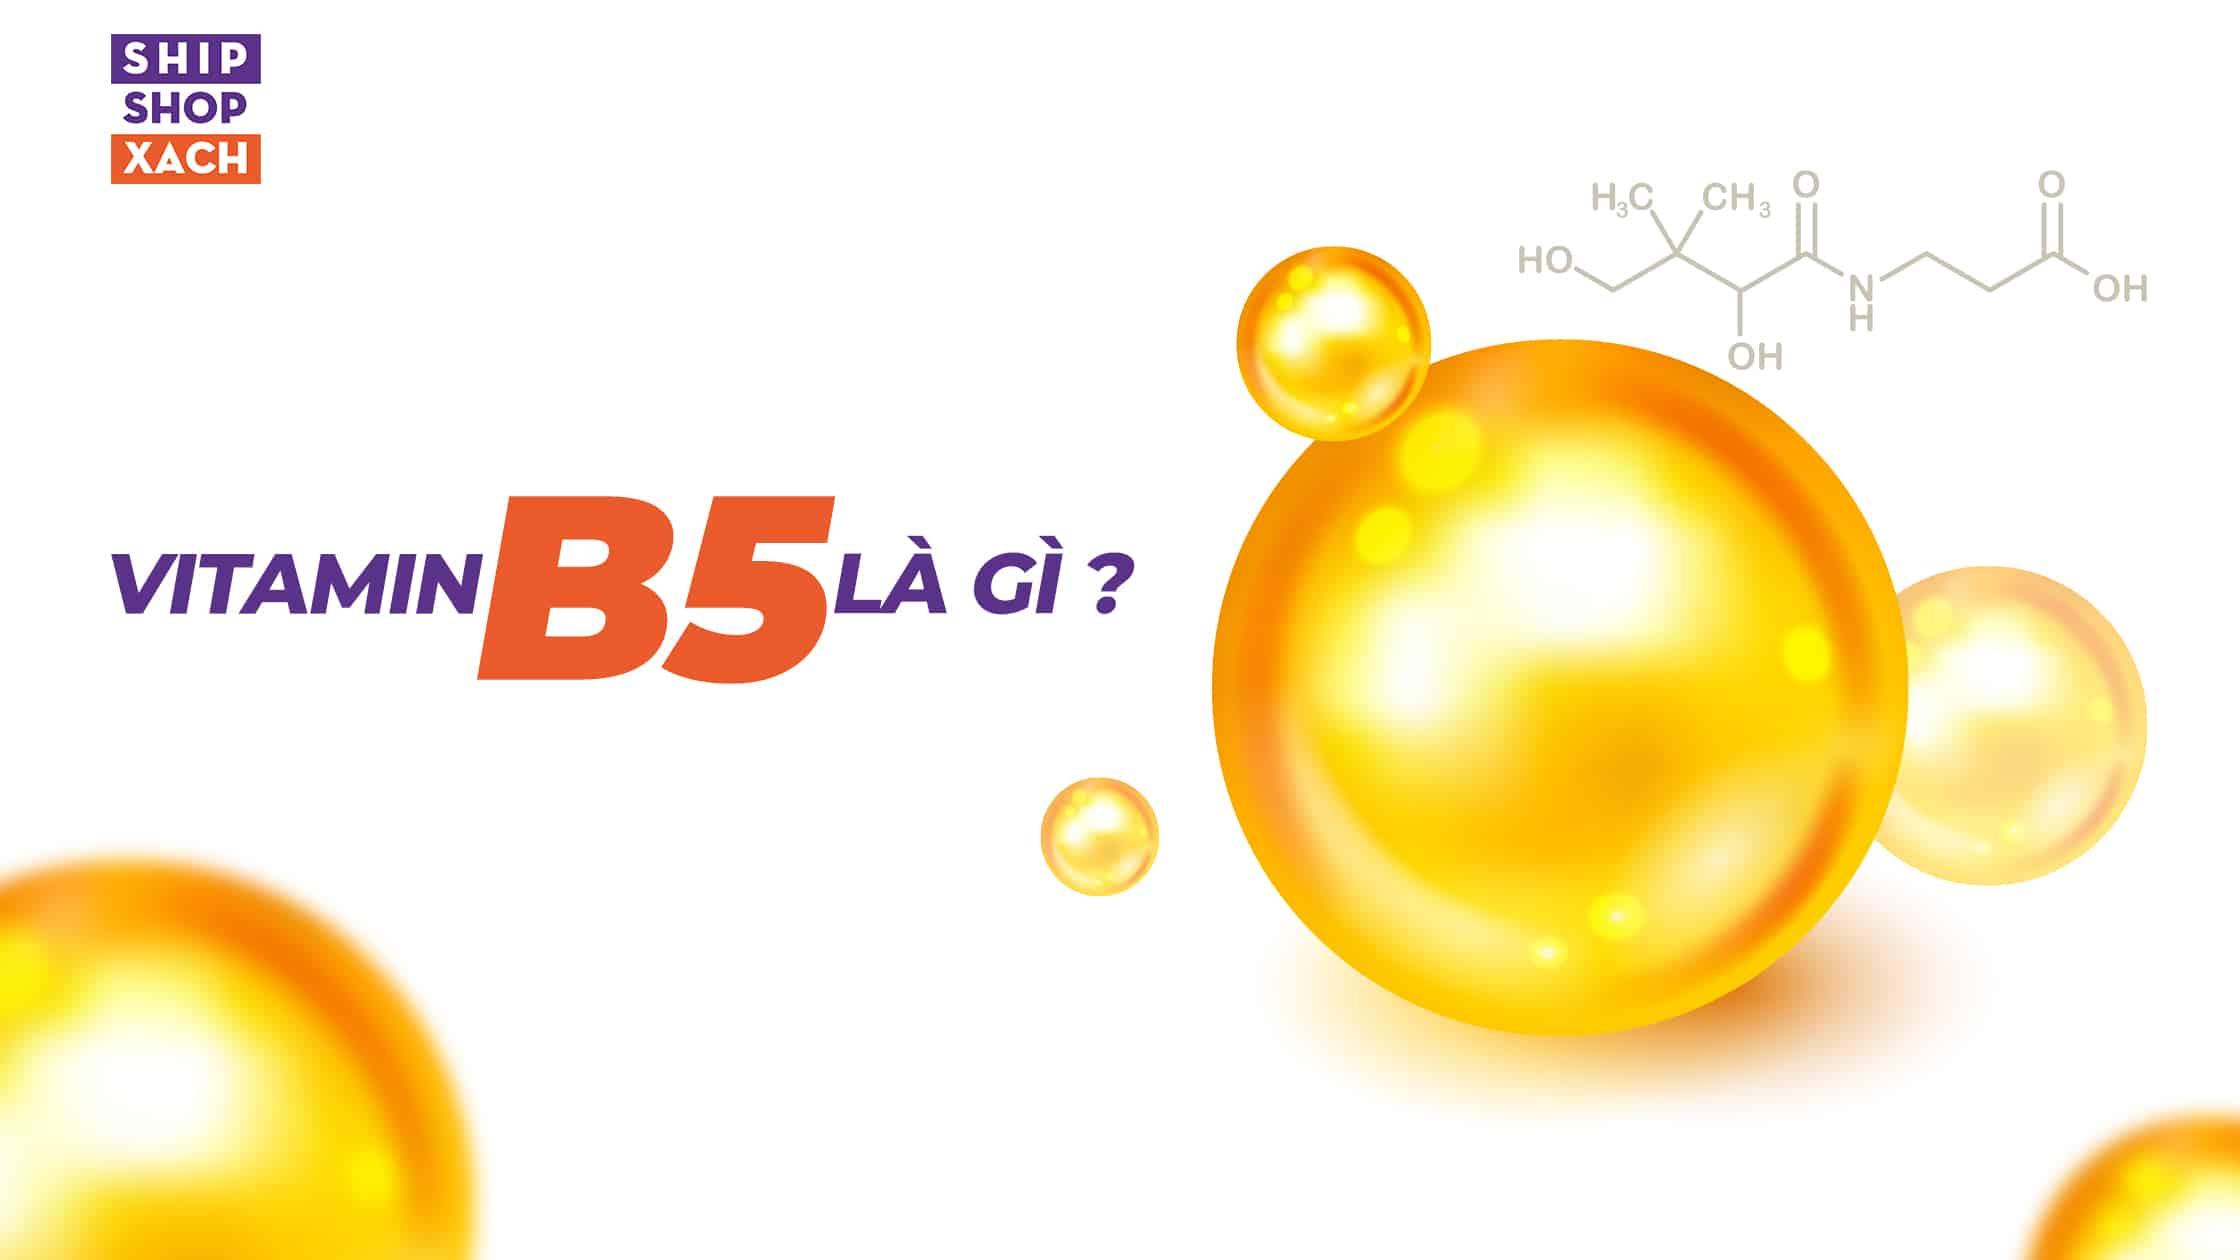 b5 la gi banner 01